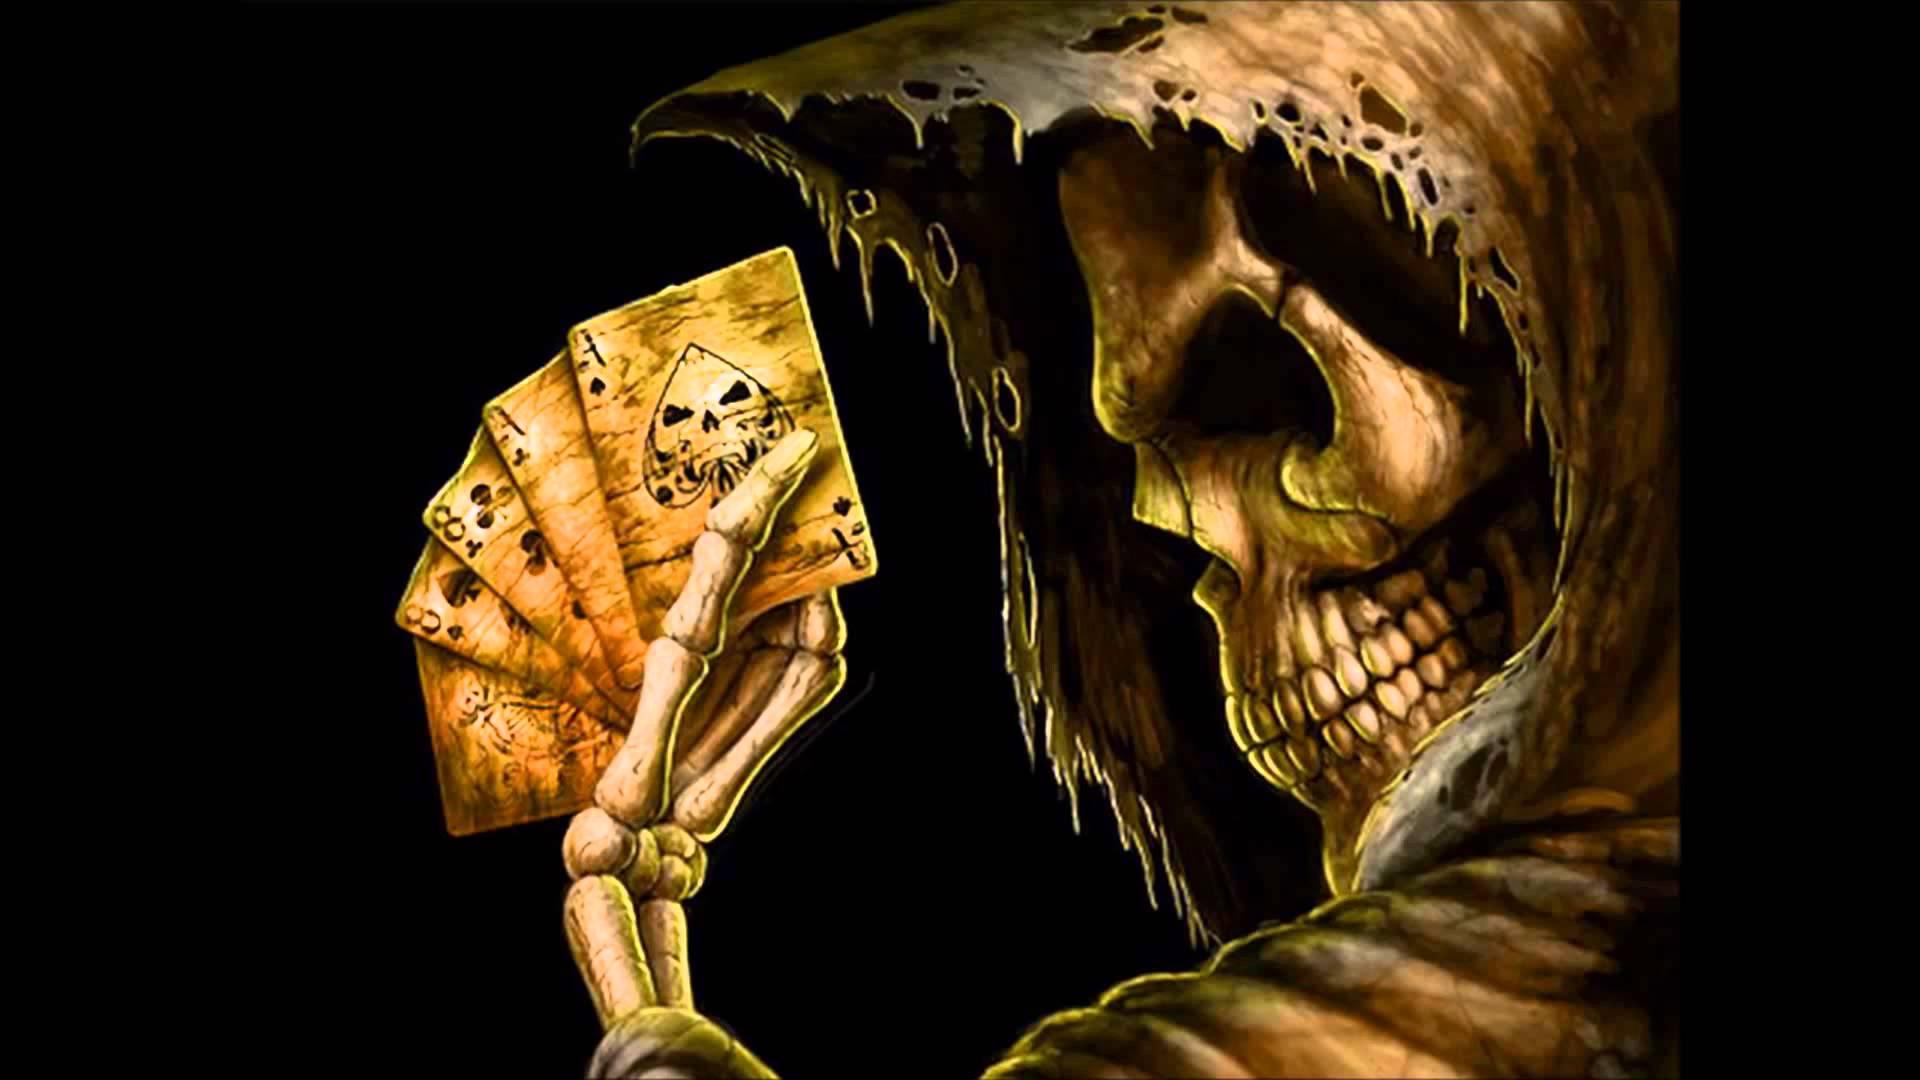 HD Quality Wallpaper | Collection: Dark, 1920x1080 Deadman's Hand